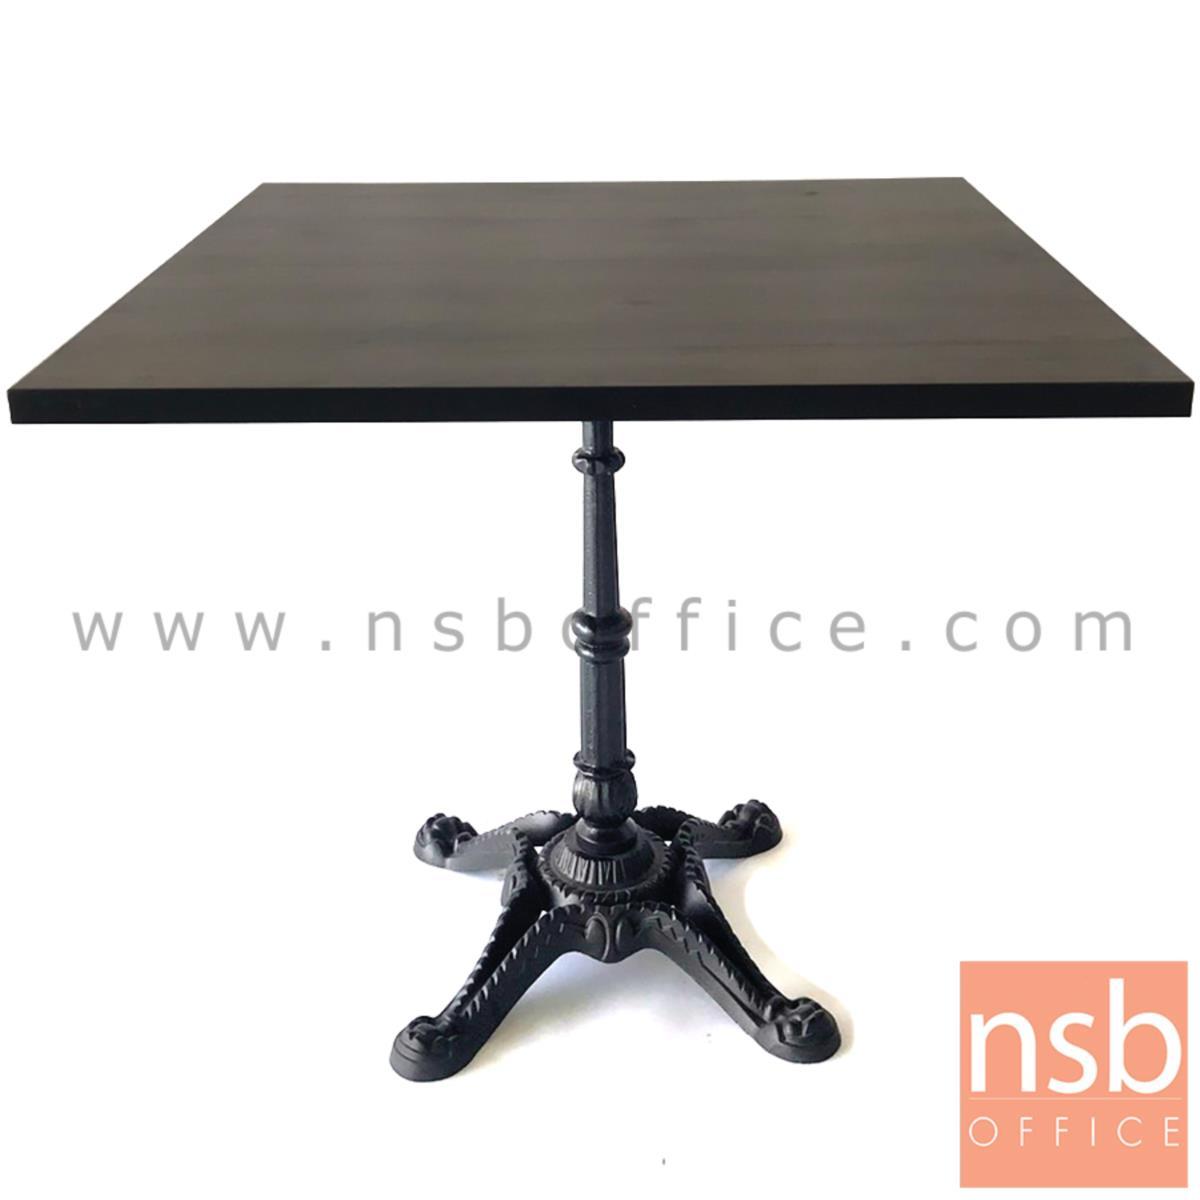 A14A171:โต๊ะบาร์ COFFEE รุ่น Lindgren (ลินด์เกรน)  ขาเหล็กฐานสี่แฉกสีดำ